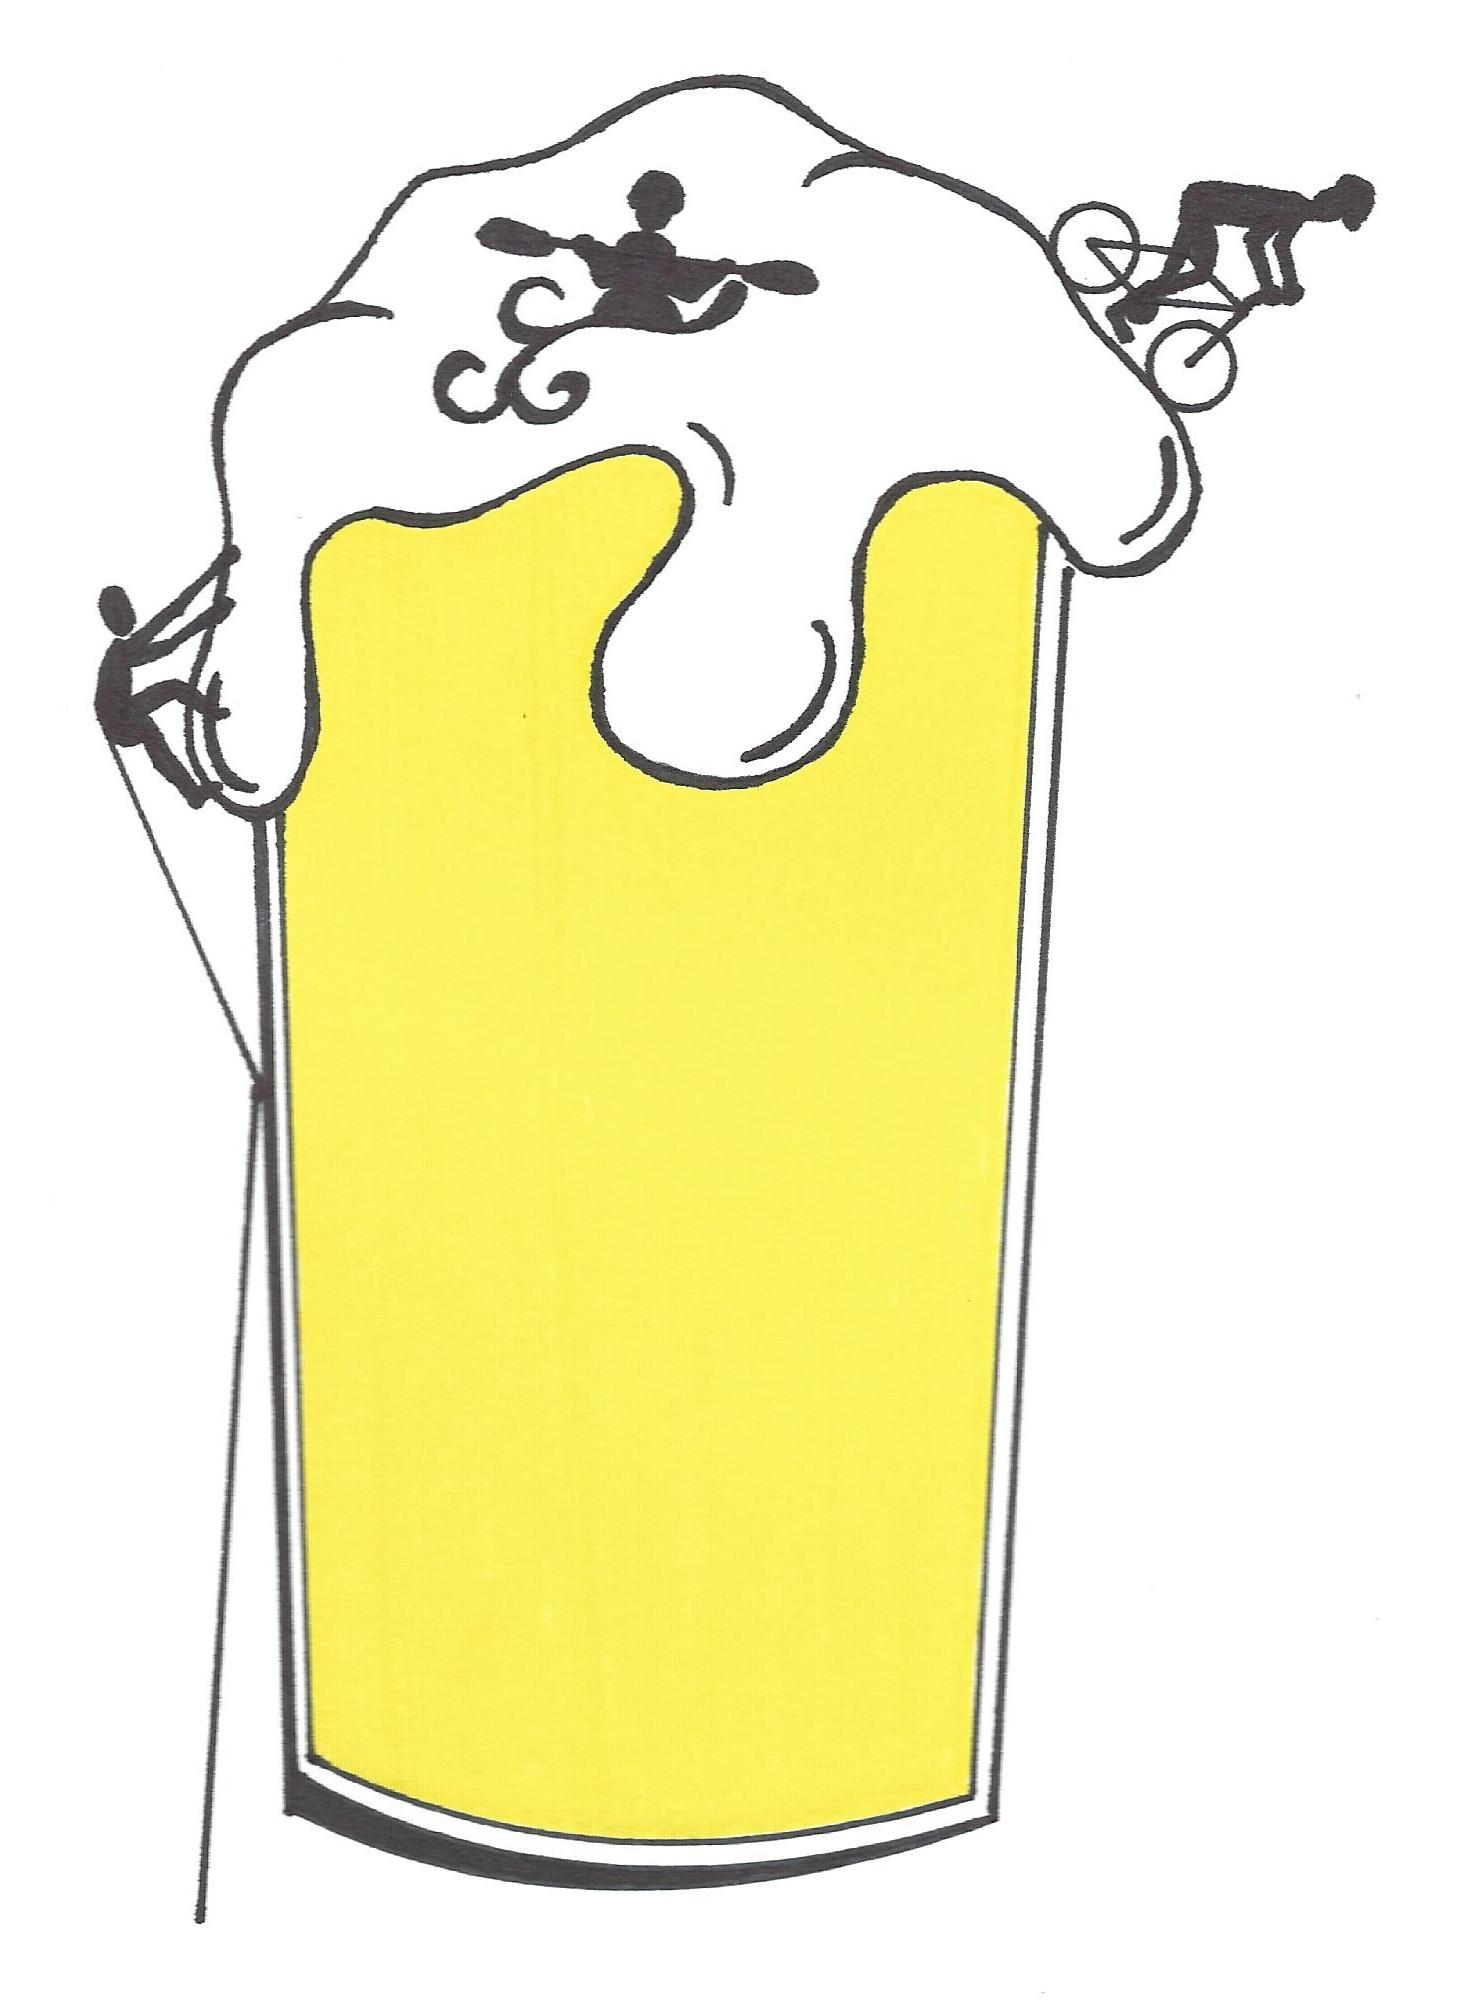 BeerandGear2019Design - Edited.jpg